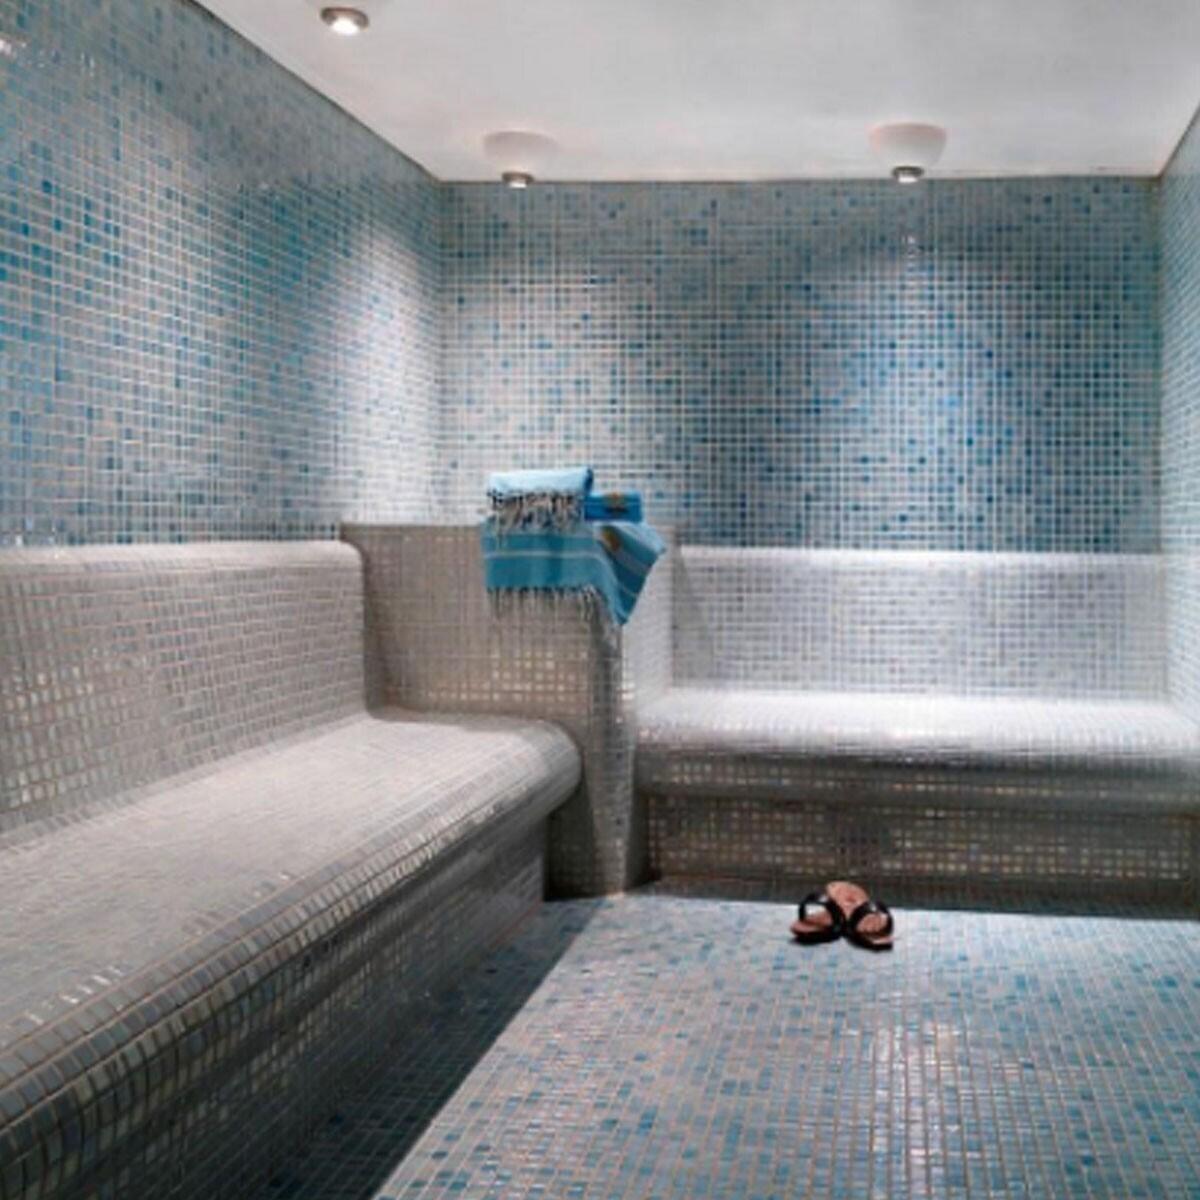 Dark Hill Otel İklima Spa'da Yüz Maskesi, Islak Alan Kullanımı, Masaj